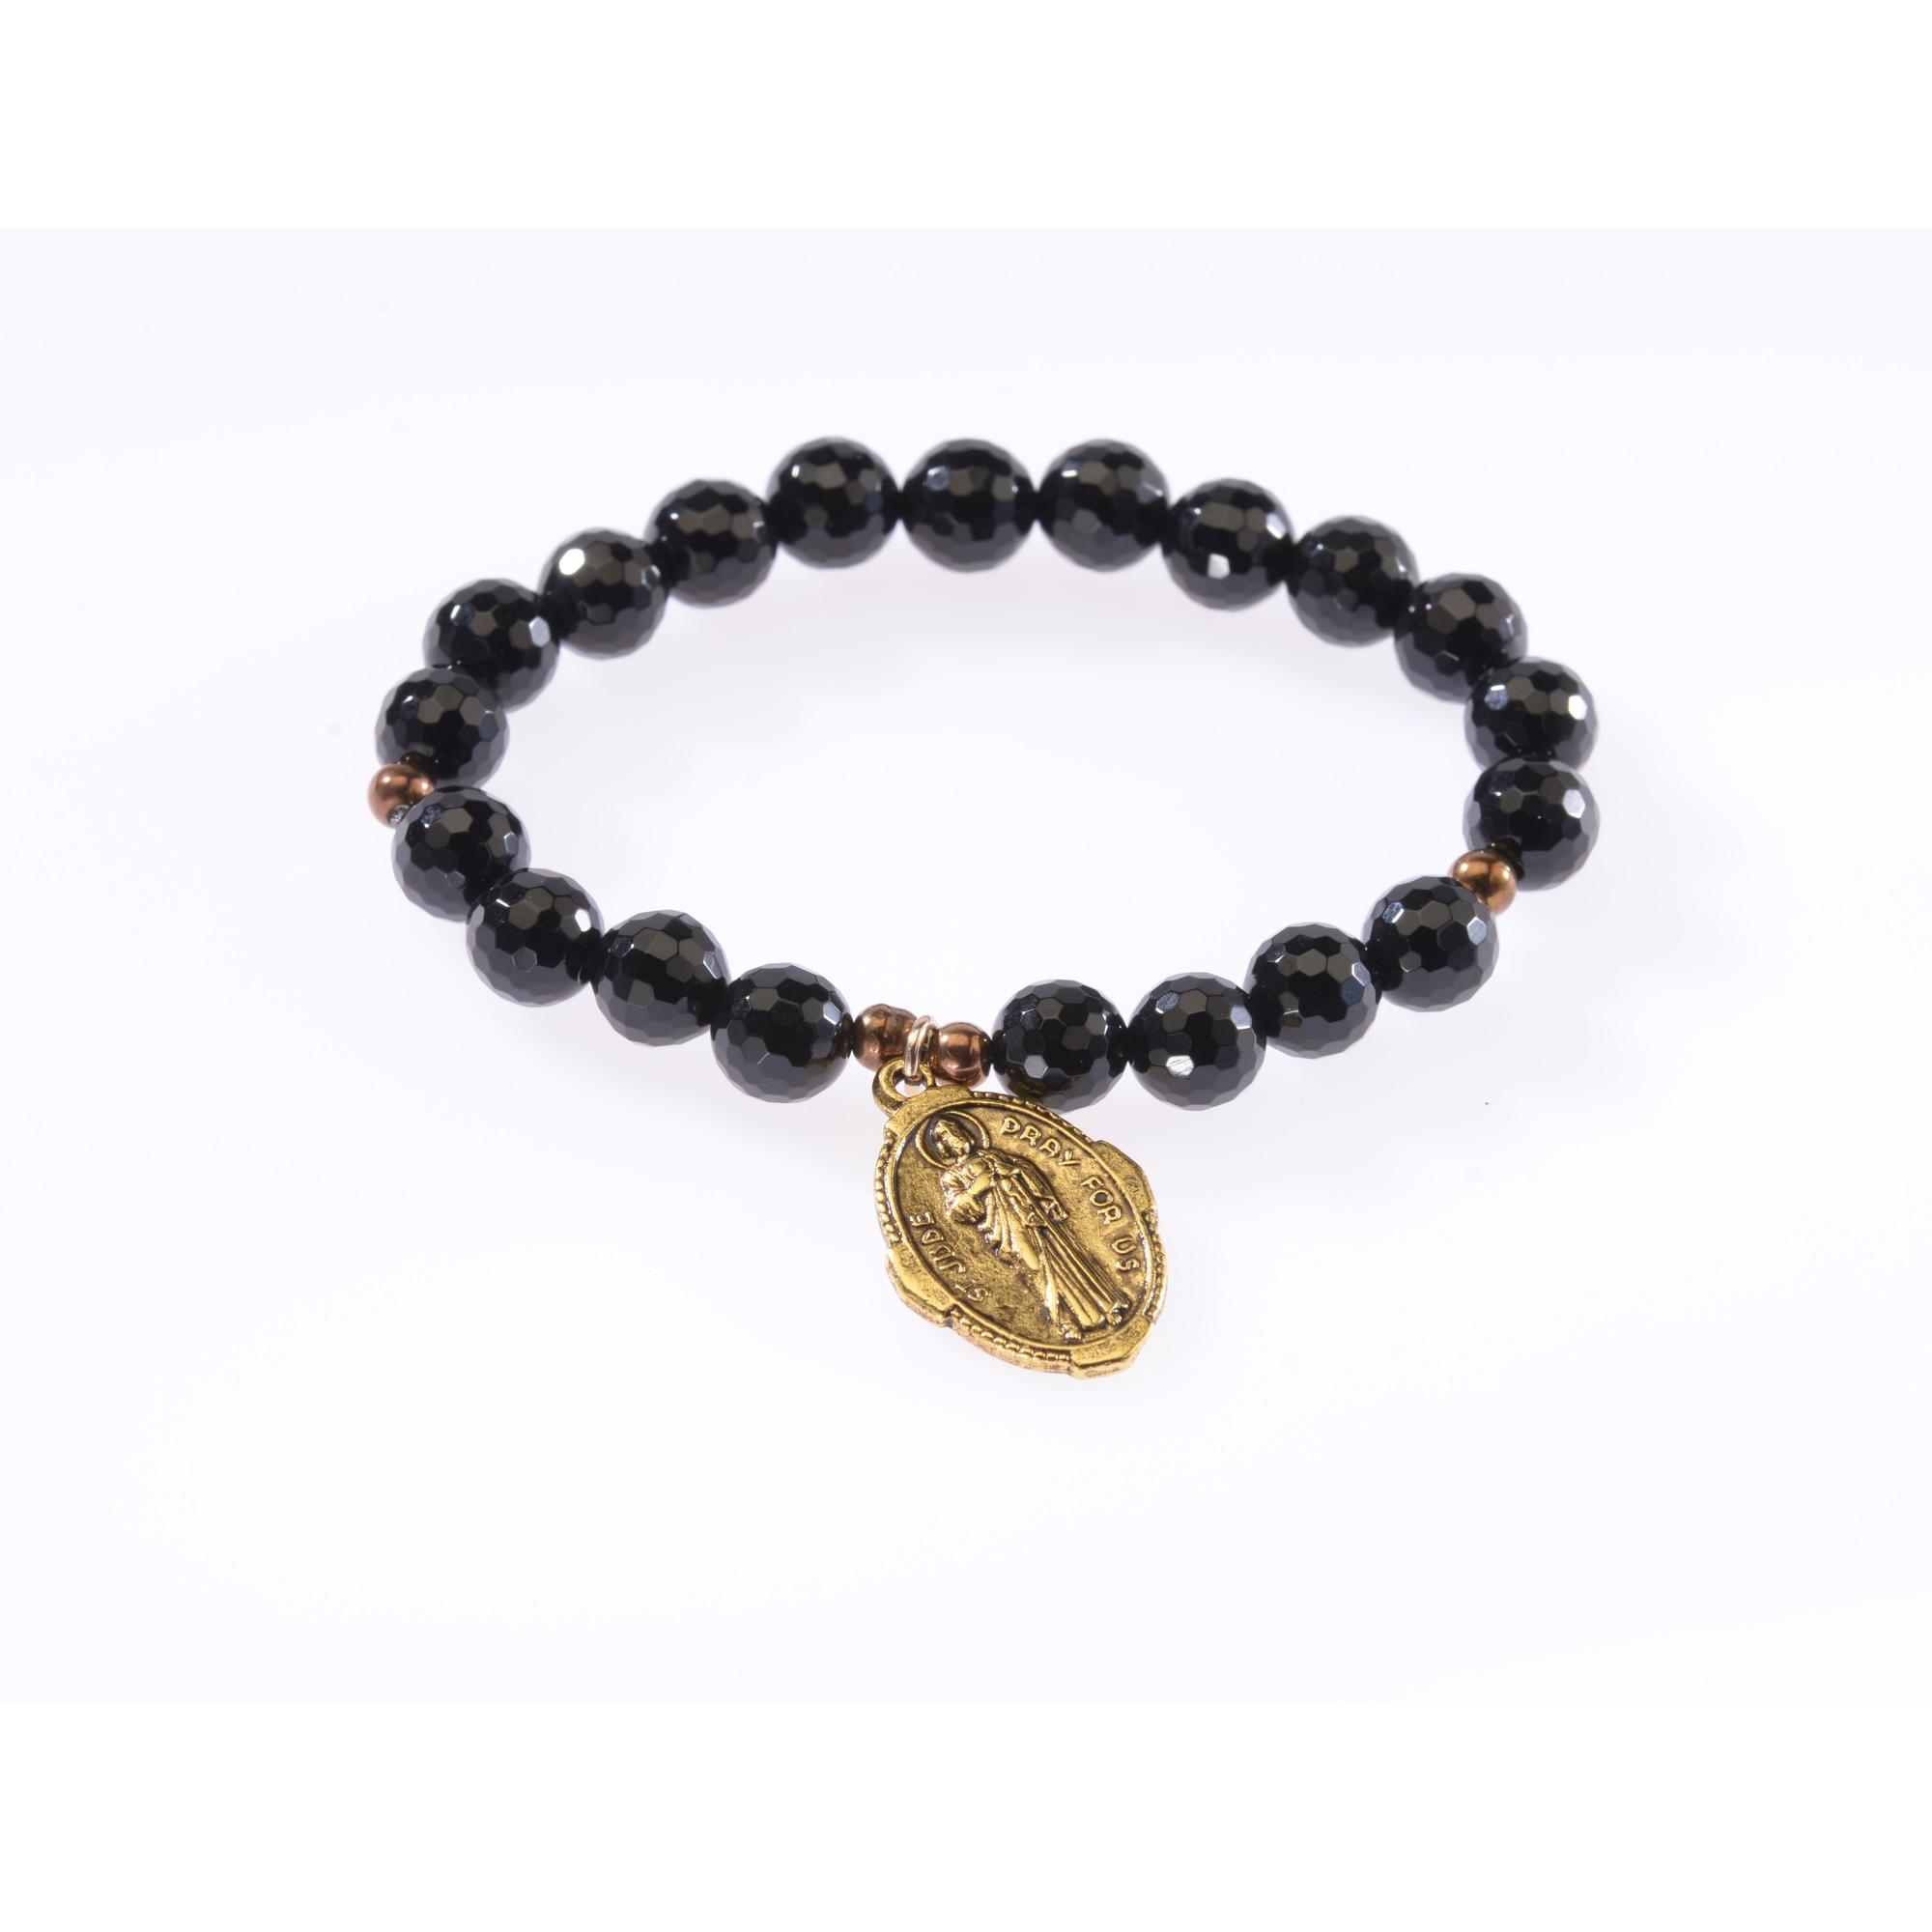 St Jude Thaddeus rosary beads medal pendant gold tone Catholic Saint